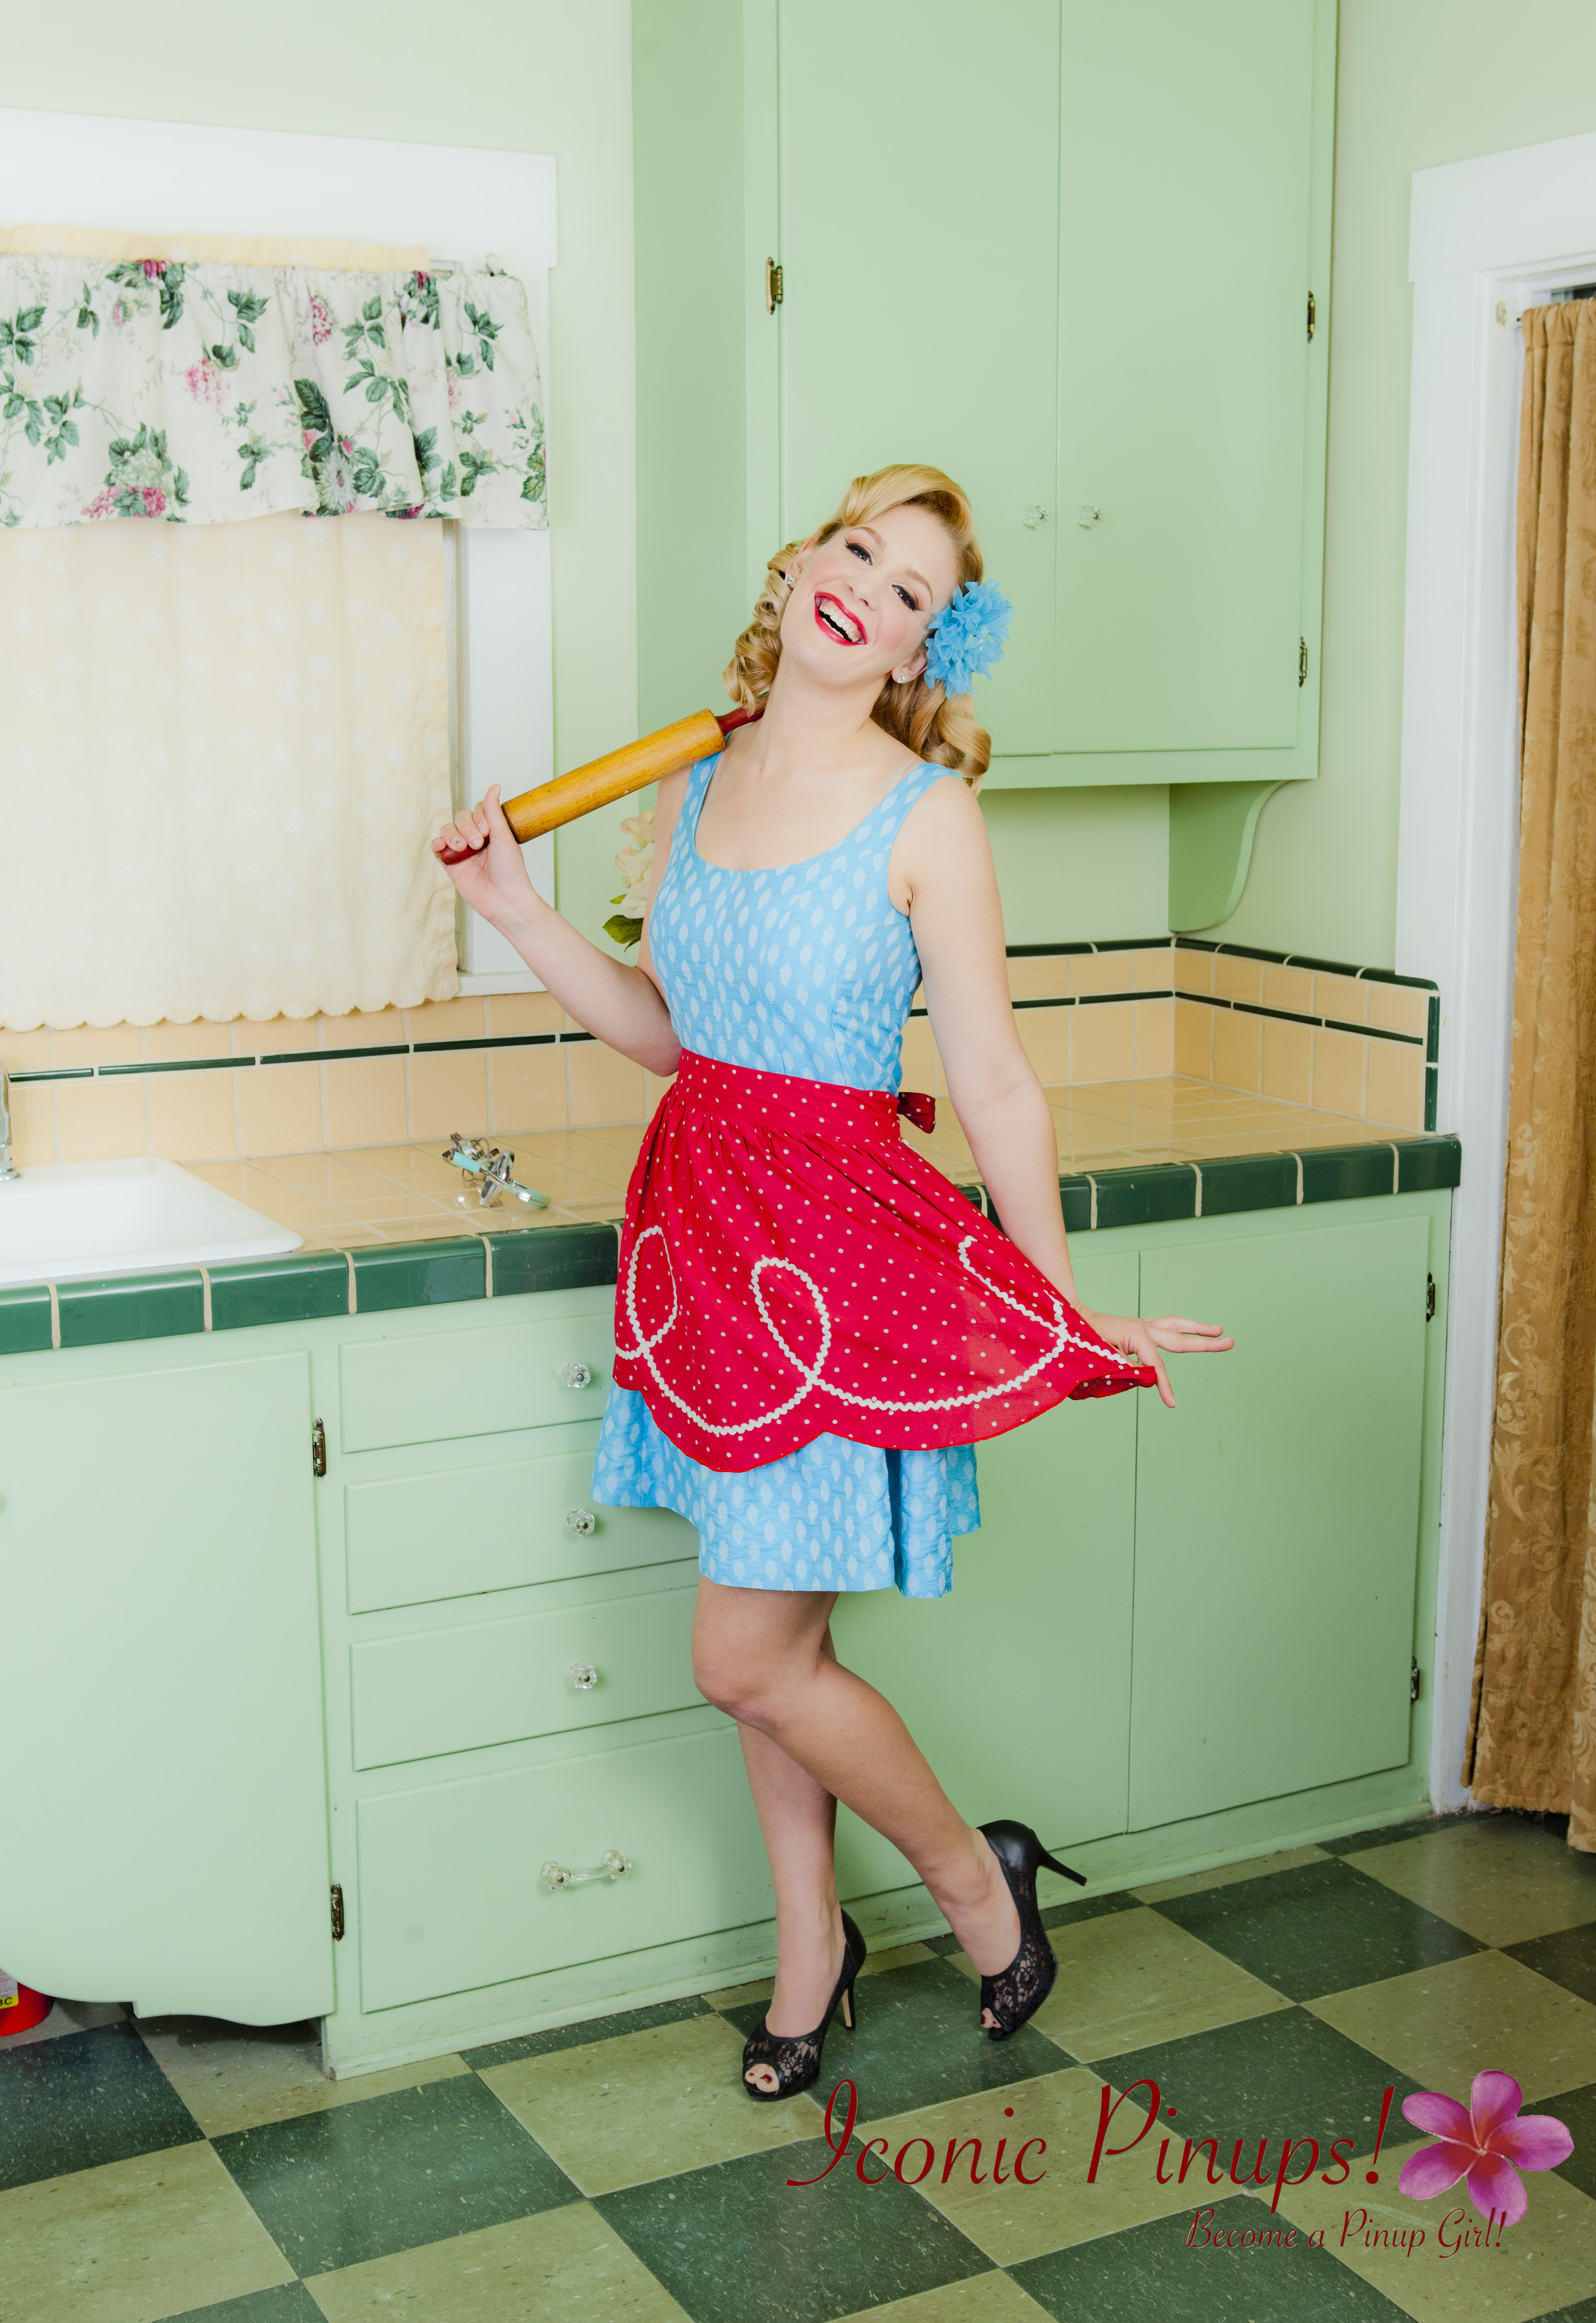 vintage_kitchen_iconicpinups.jpg